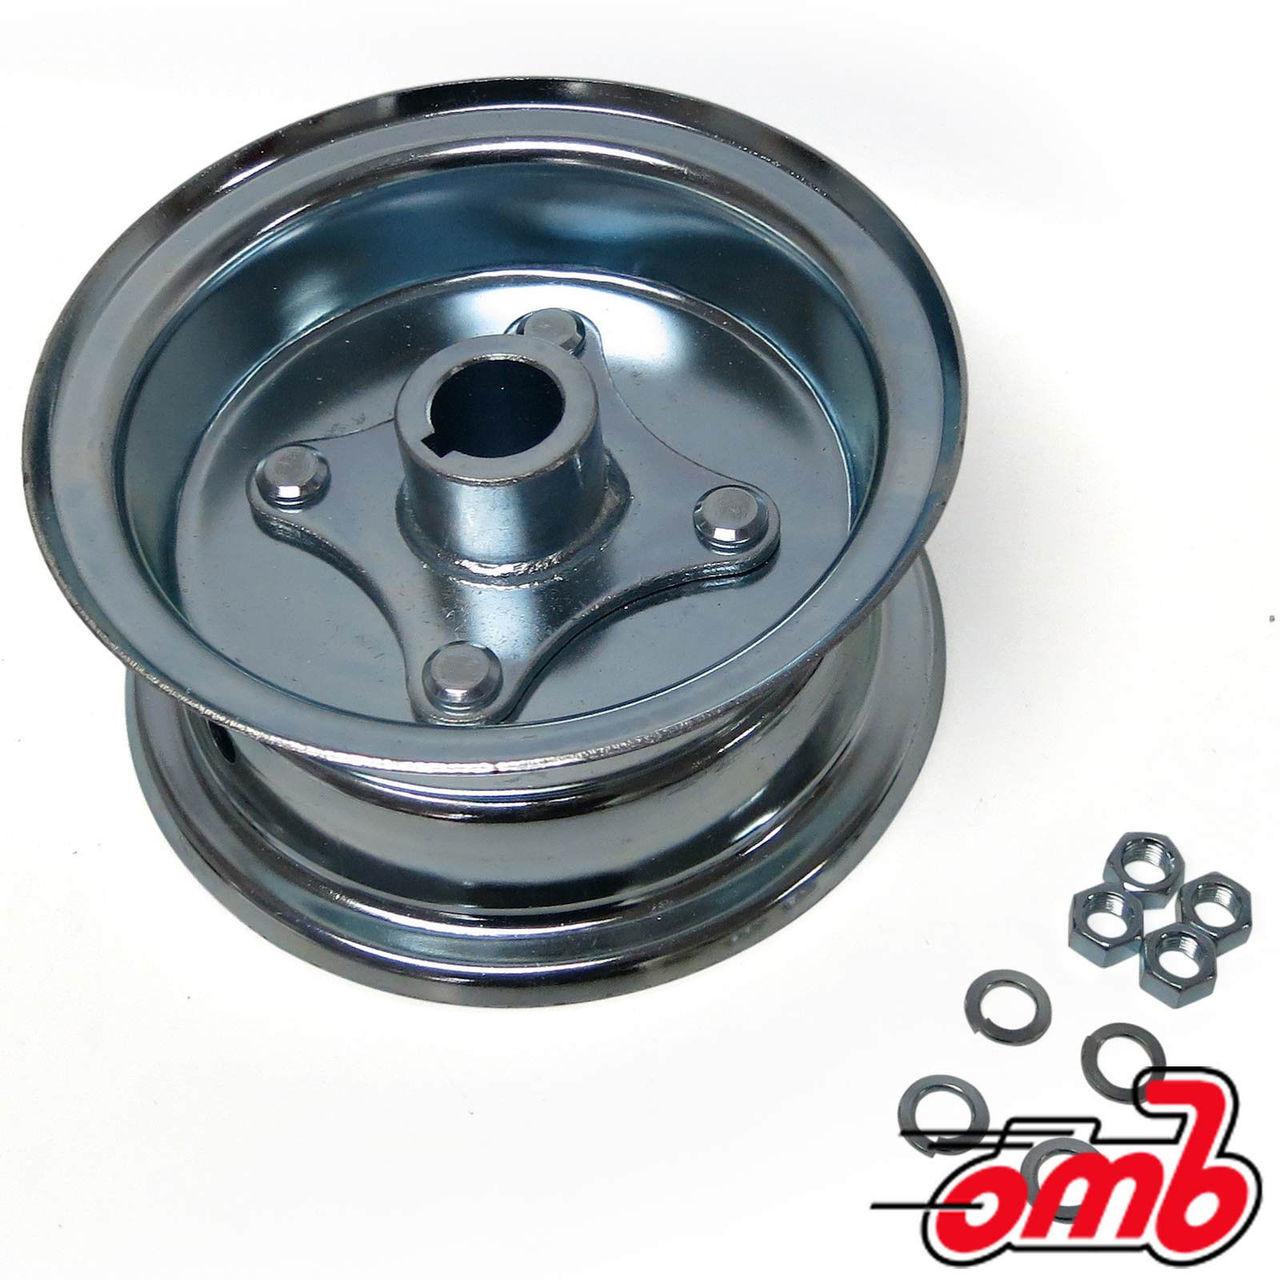 "(2) 5"" Go Kart Live Axle Wheels - Split Steel 2pc Rims - 1"" Bore"